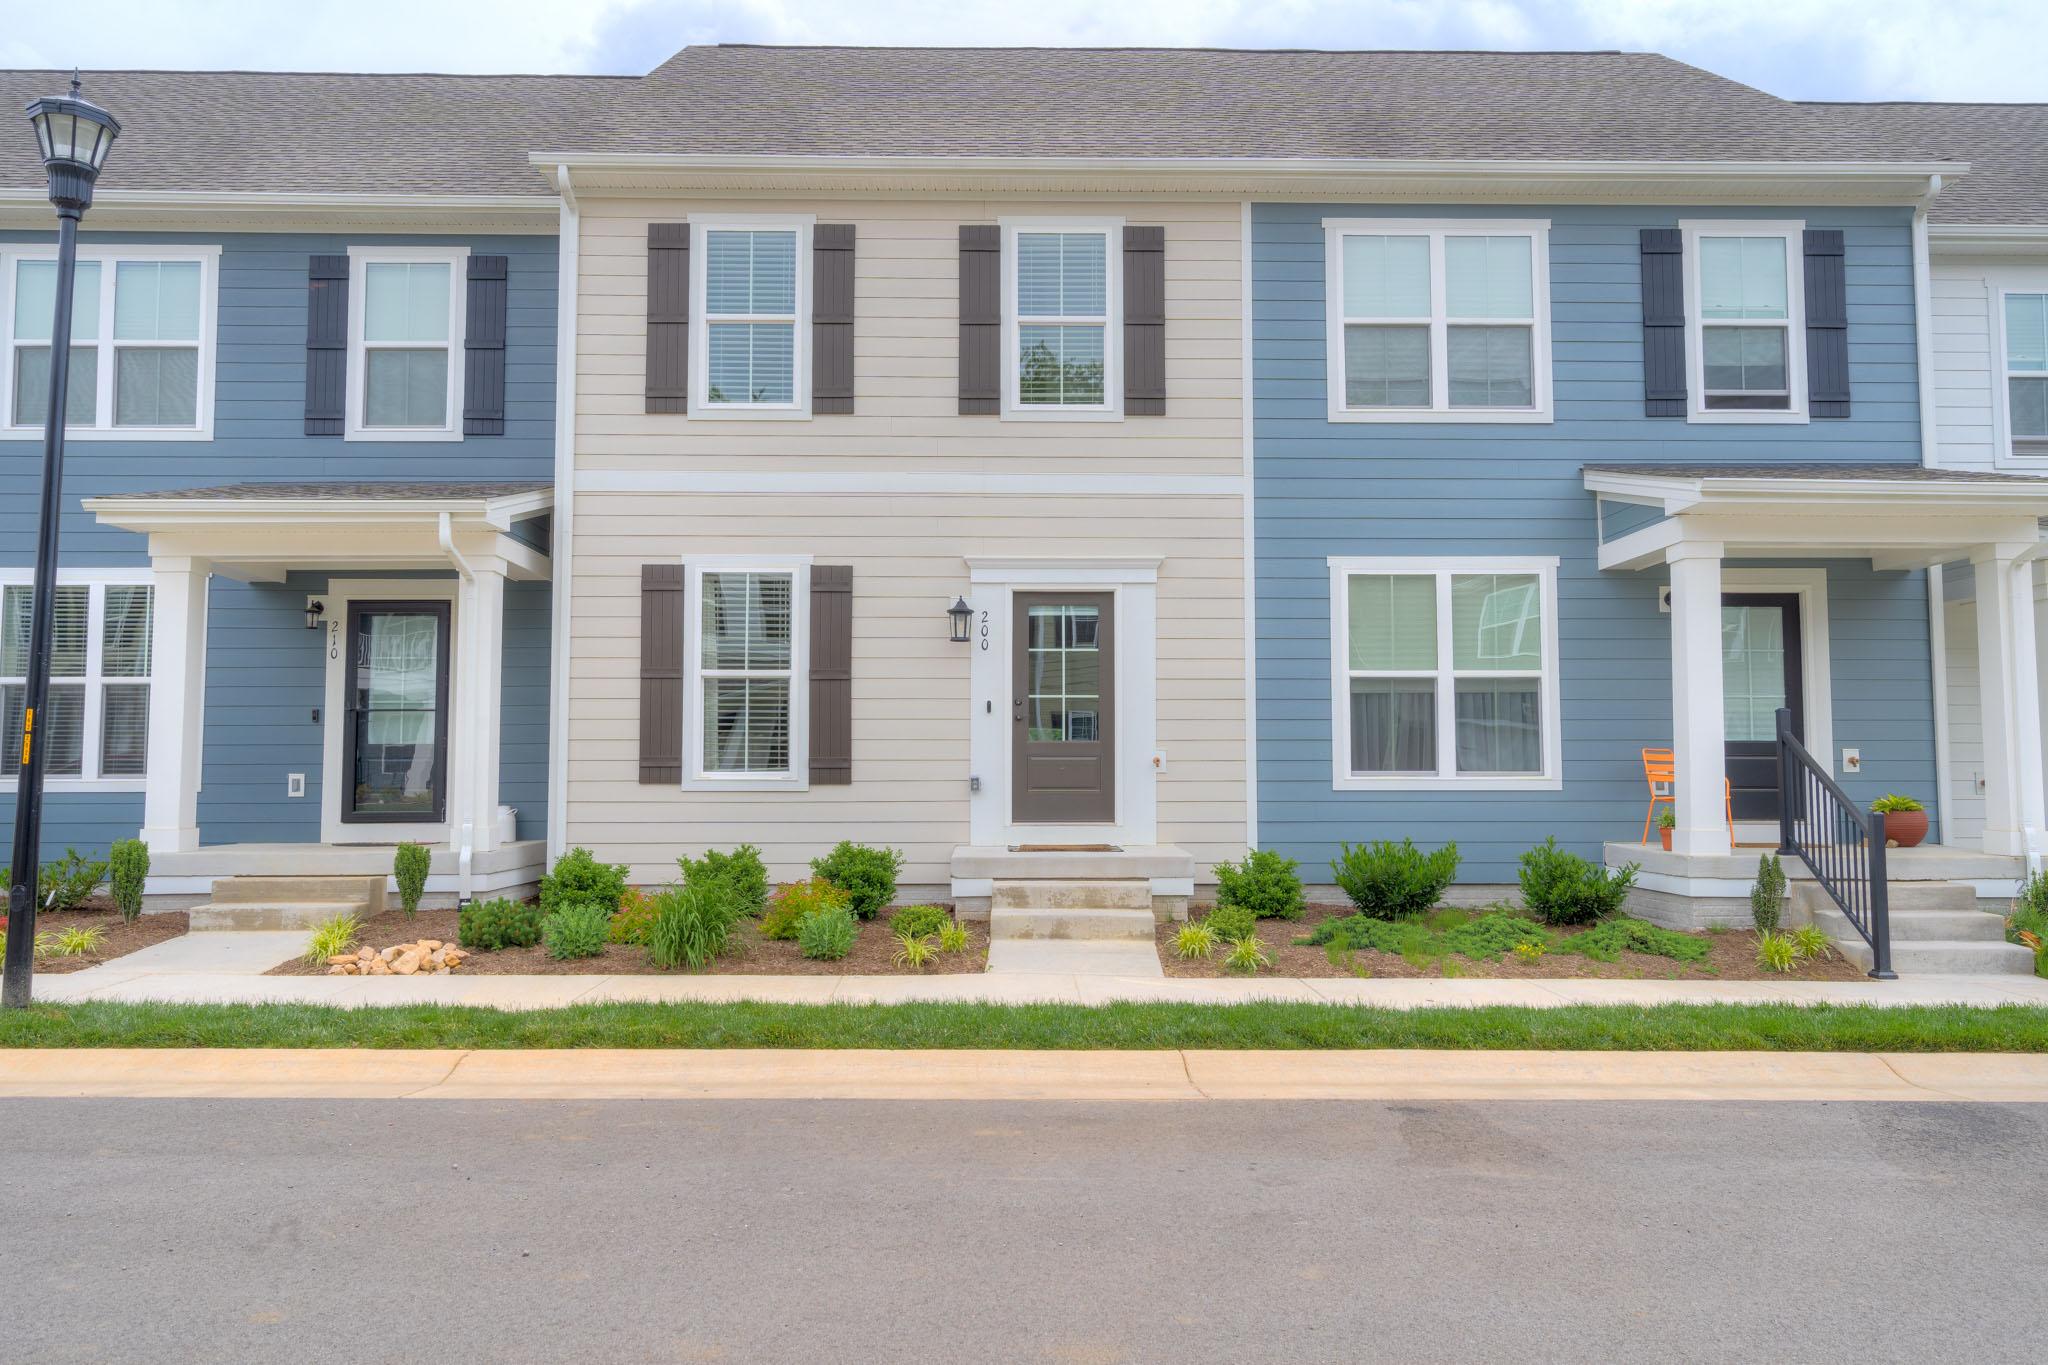 200 Hamilton Avenue NW, Christiansburg, Virginia 24073